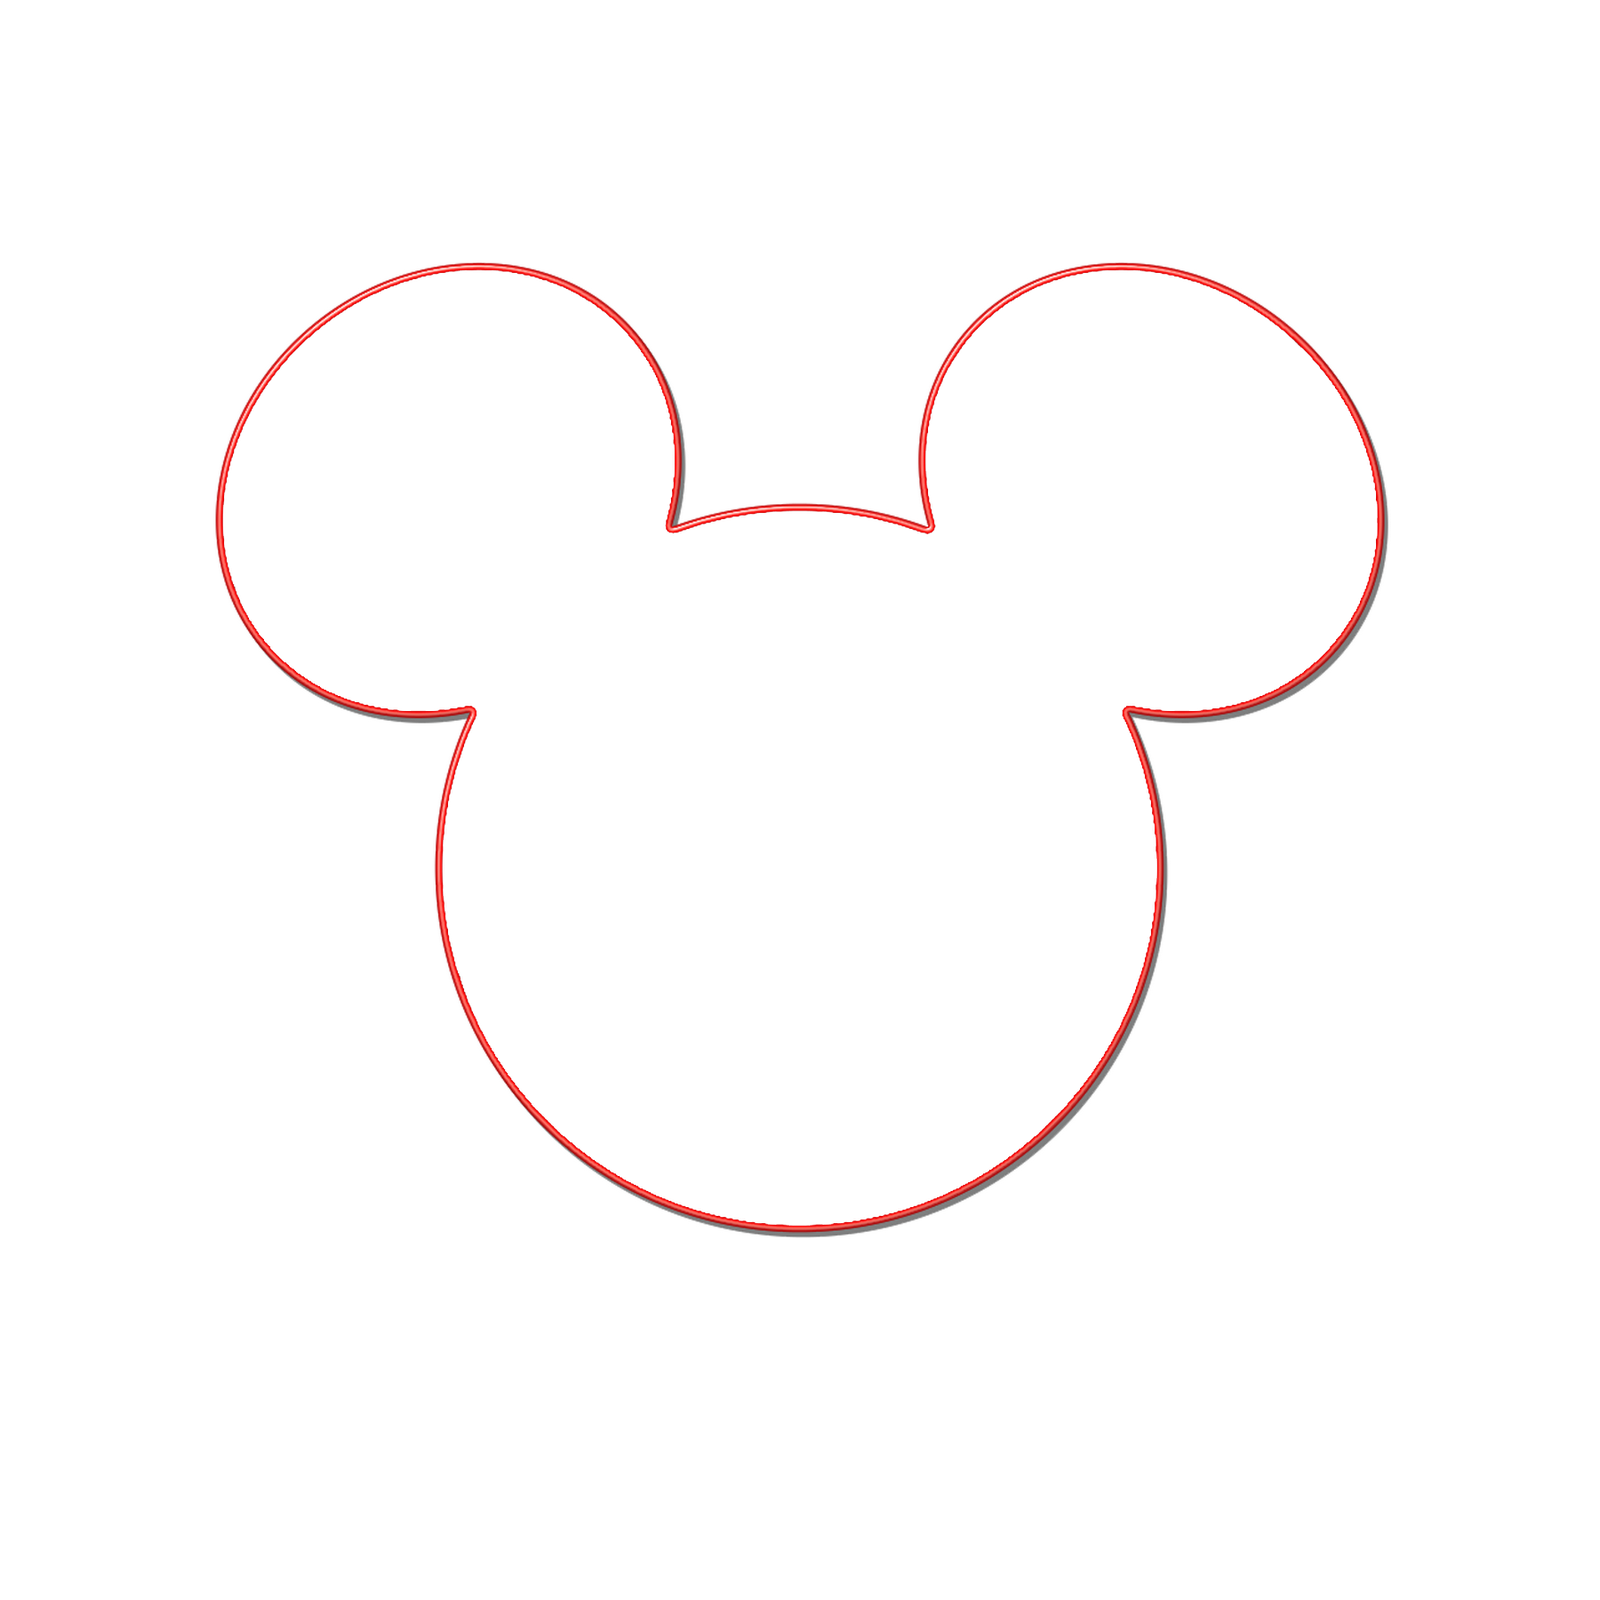 mickey mouse clipart u0026middot; head clipart u0026middot; proof clipart u0026middot; iq clipart